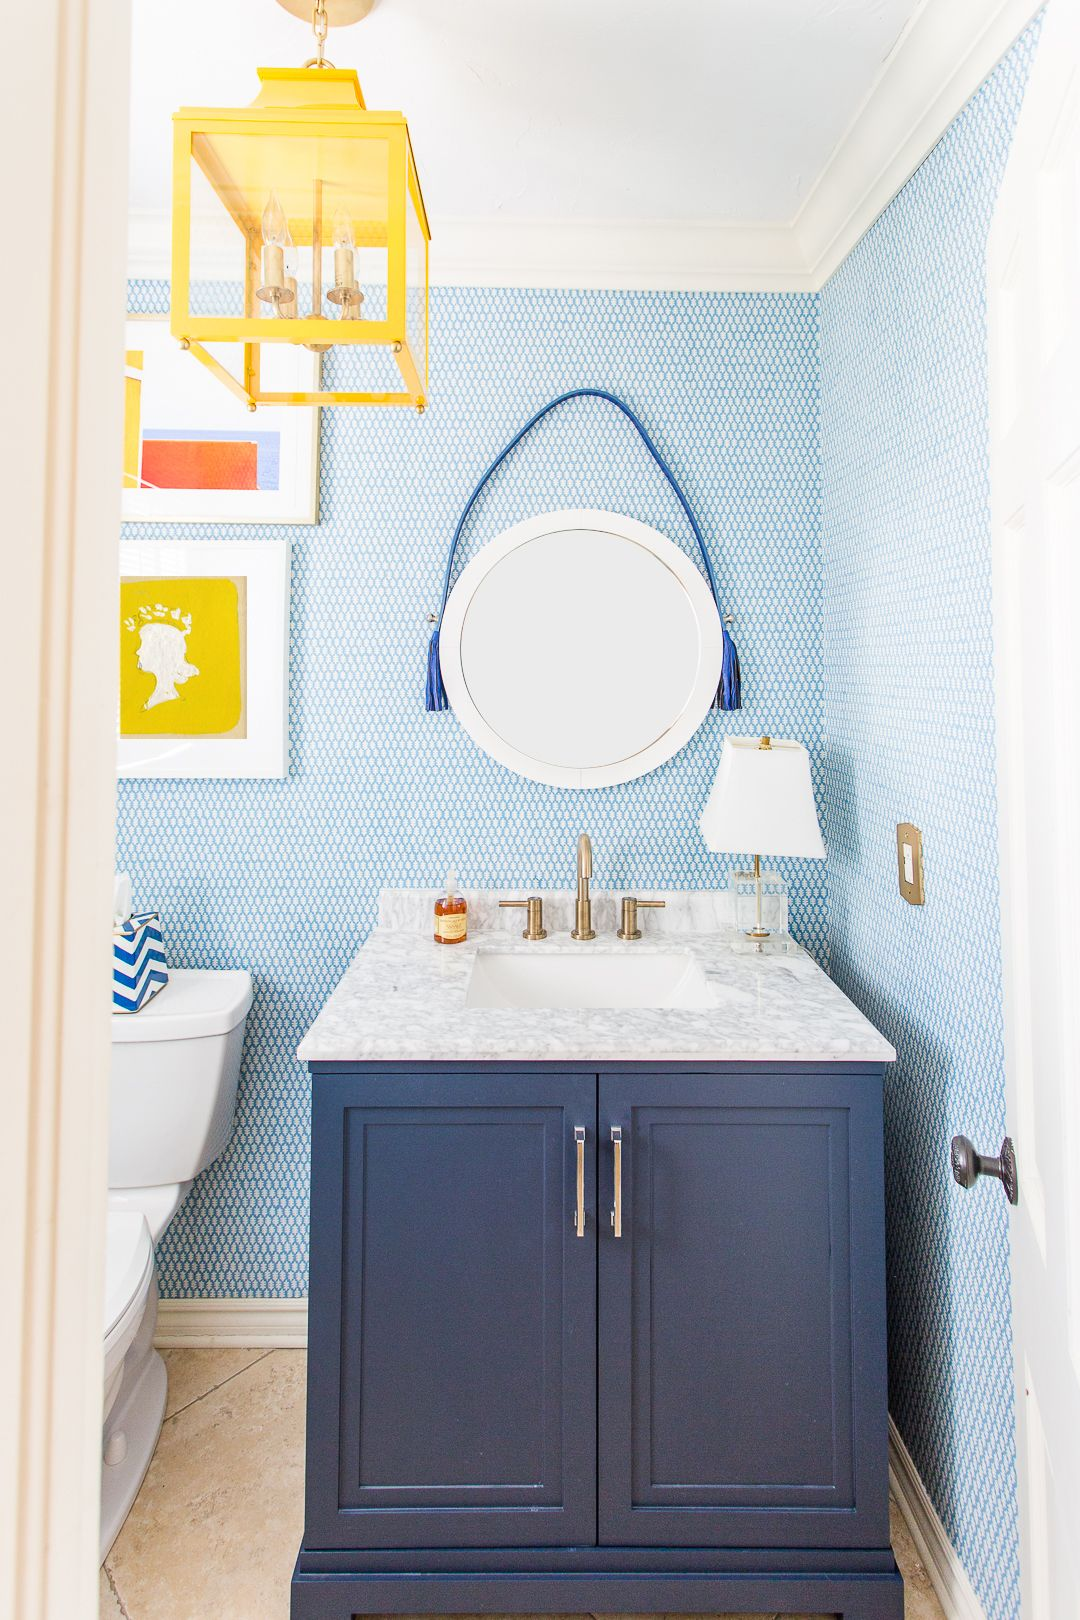 Powder Bathroom Reveal Pencil Shavings Studio Trendy Bathroom Bathroom Wallpaper Blue Vanity